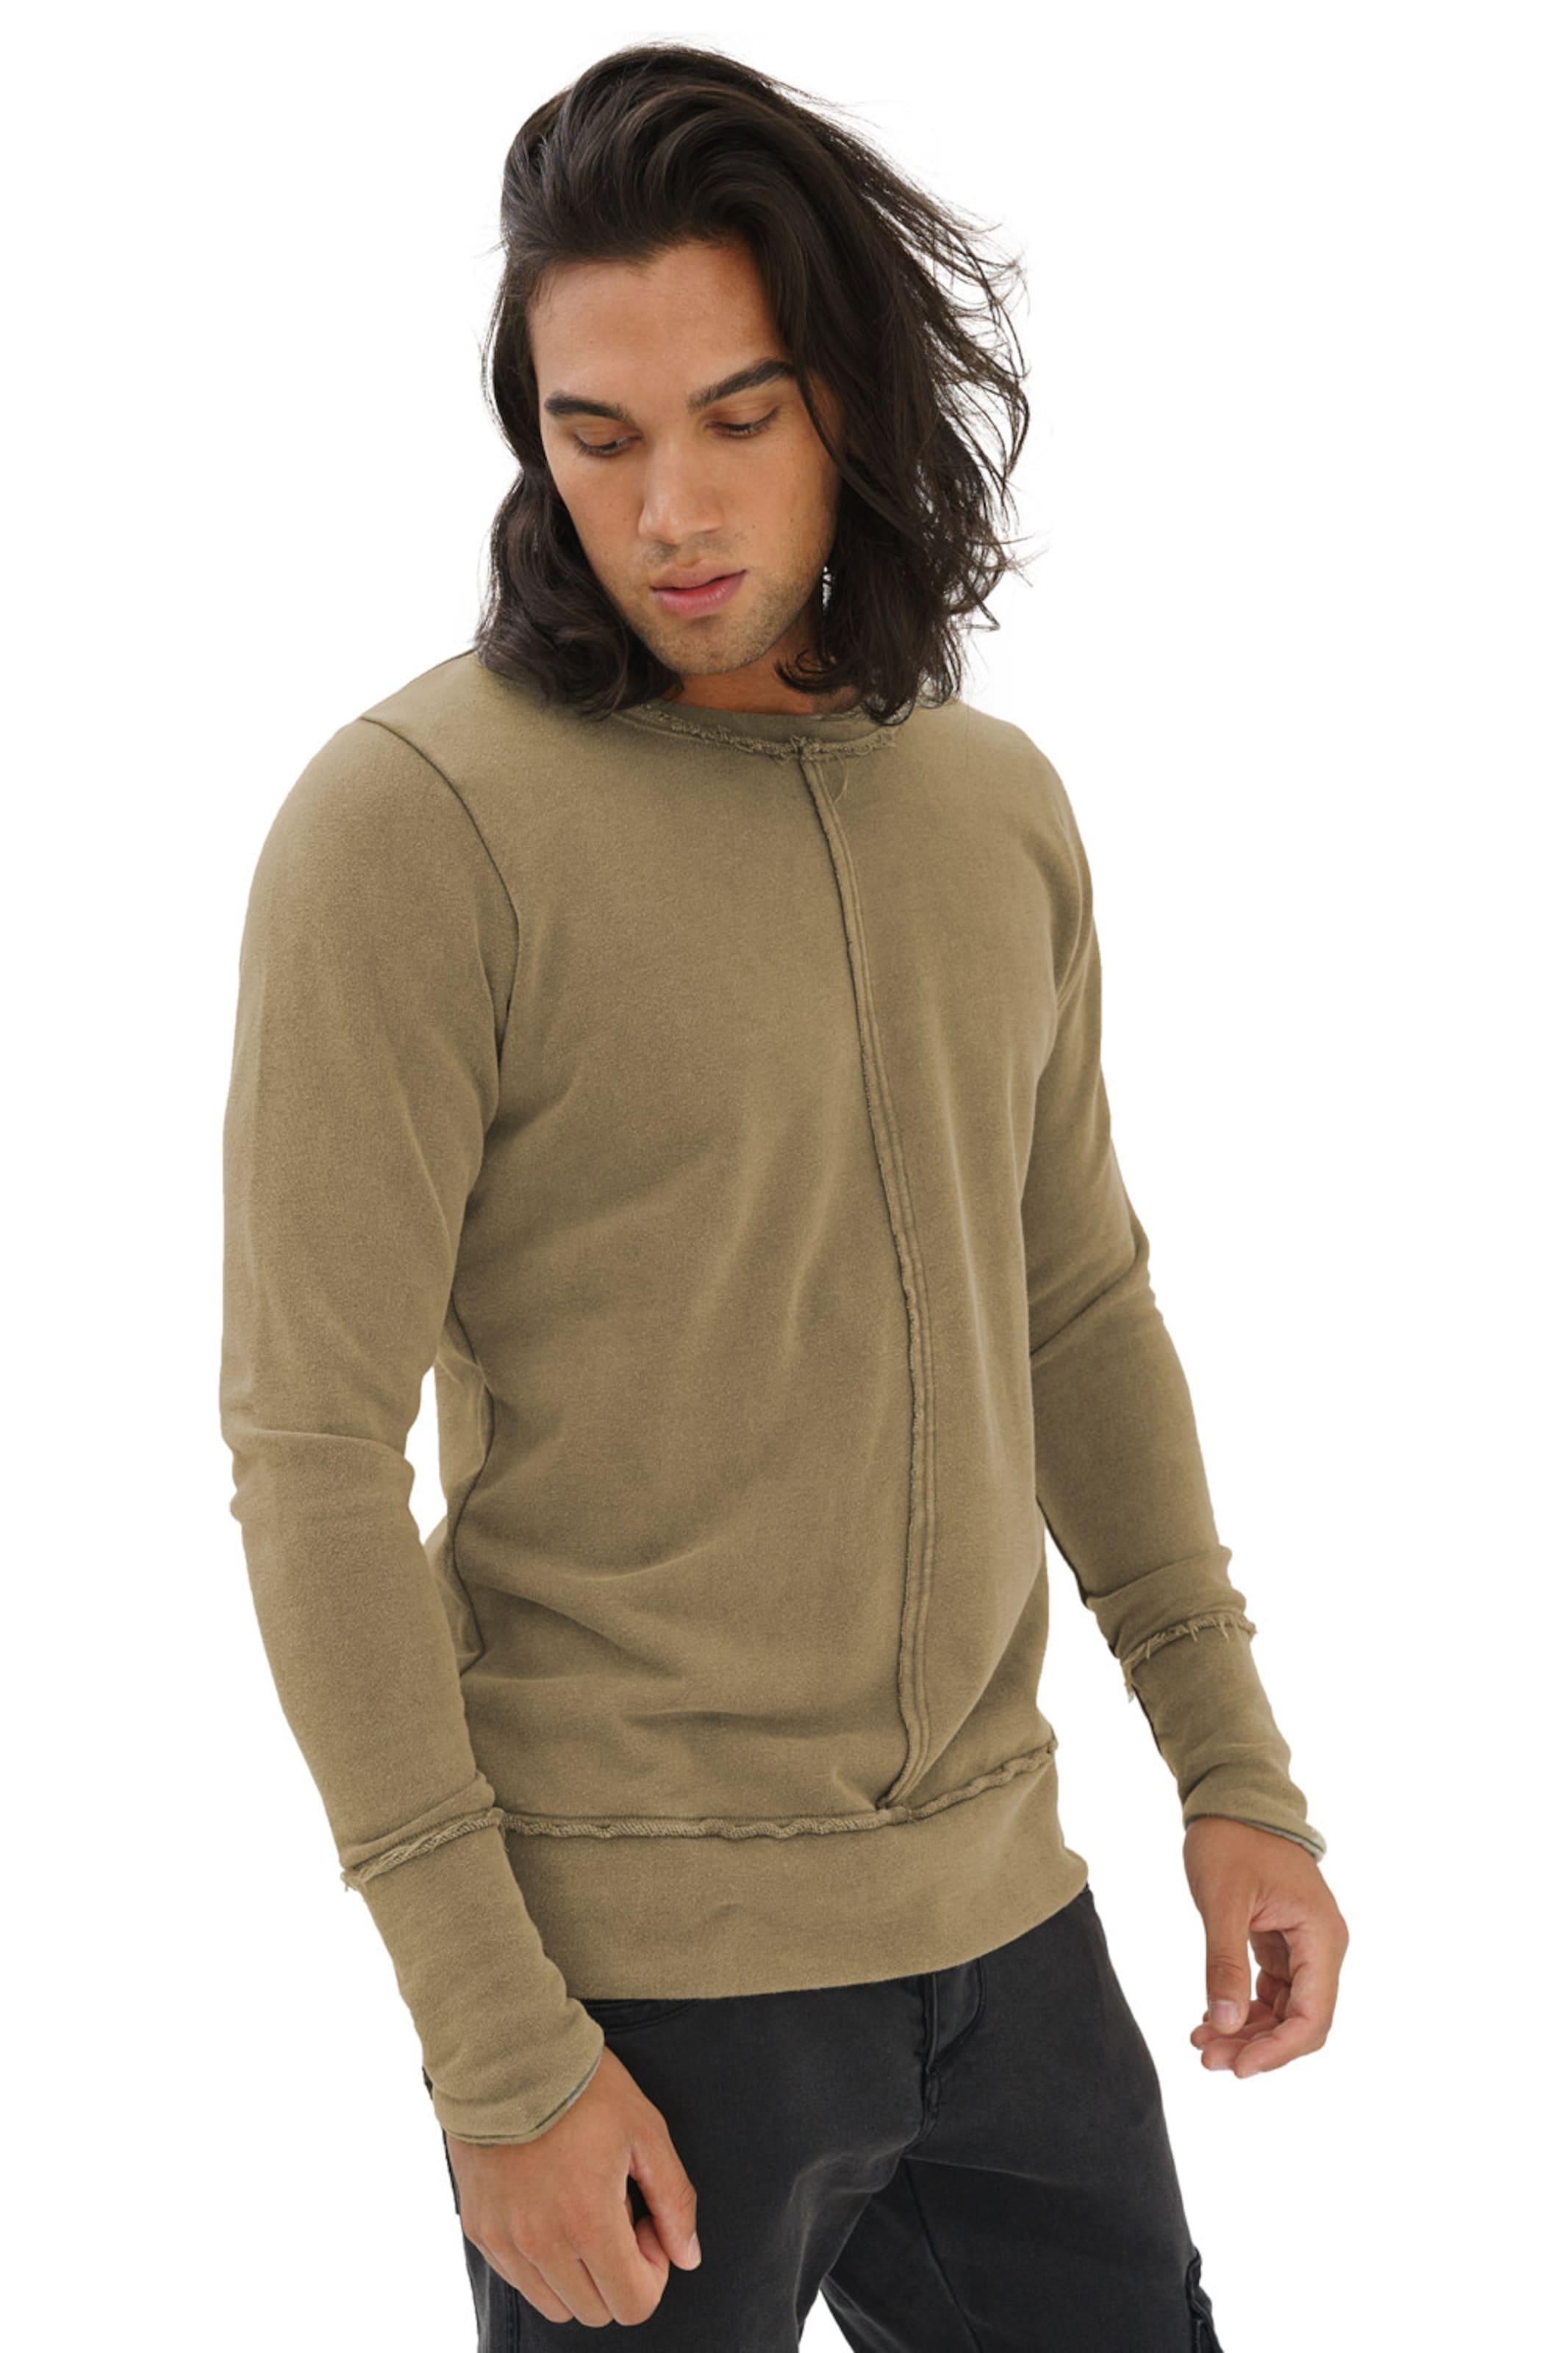 Sweatshirt Trueprodigy In 'fray' Sweatshirt In Khaki 'fray' Trueprodigy Khaki Trueprodigy sBtQxrdhoC